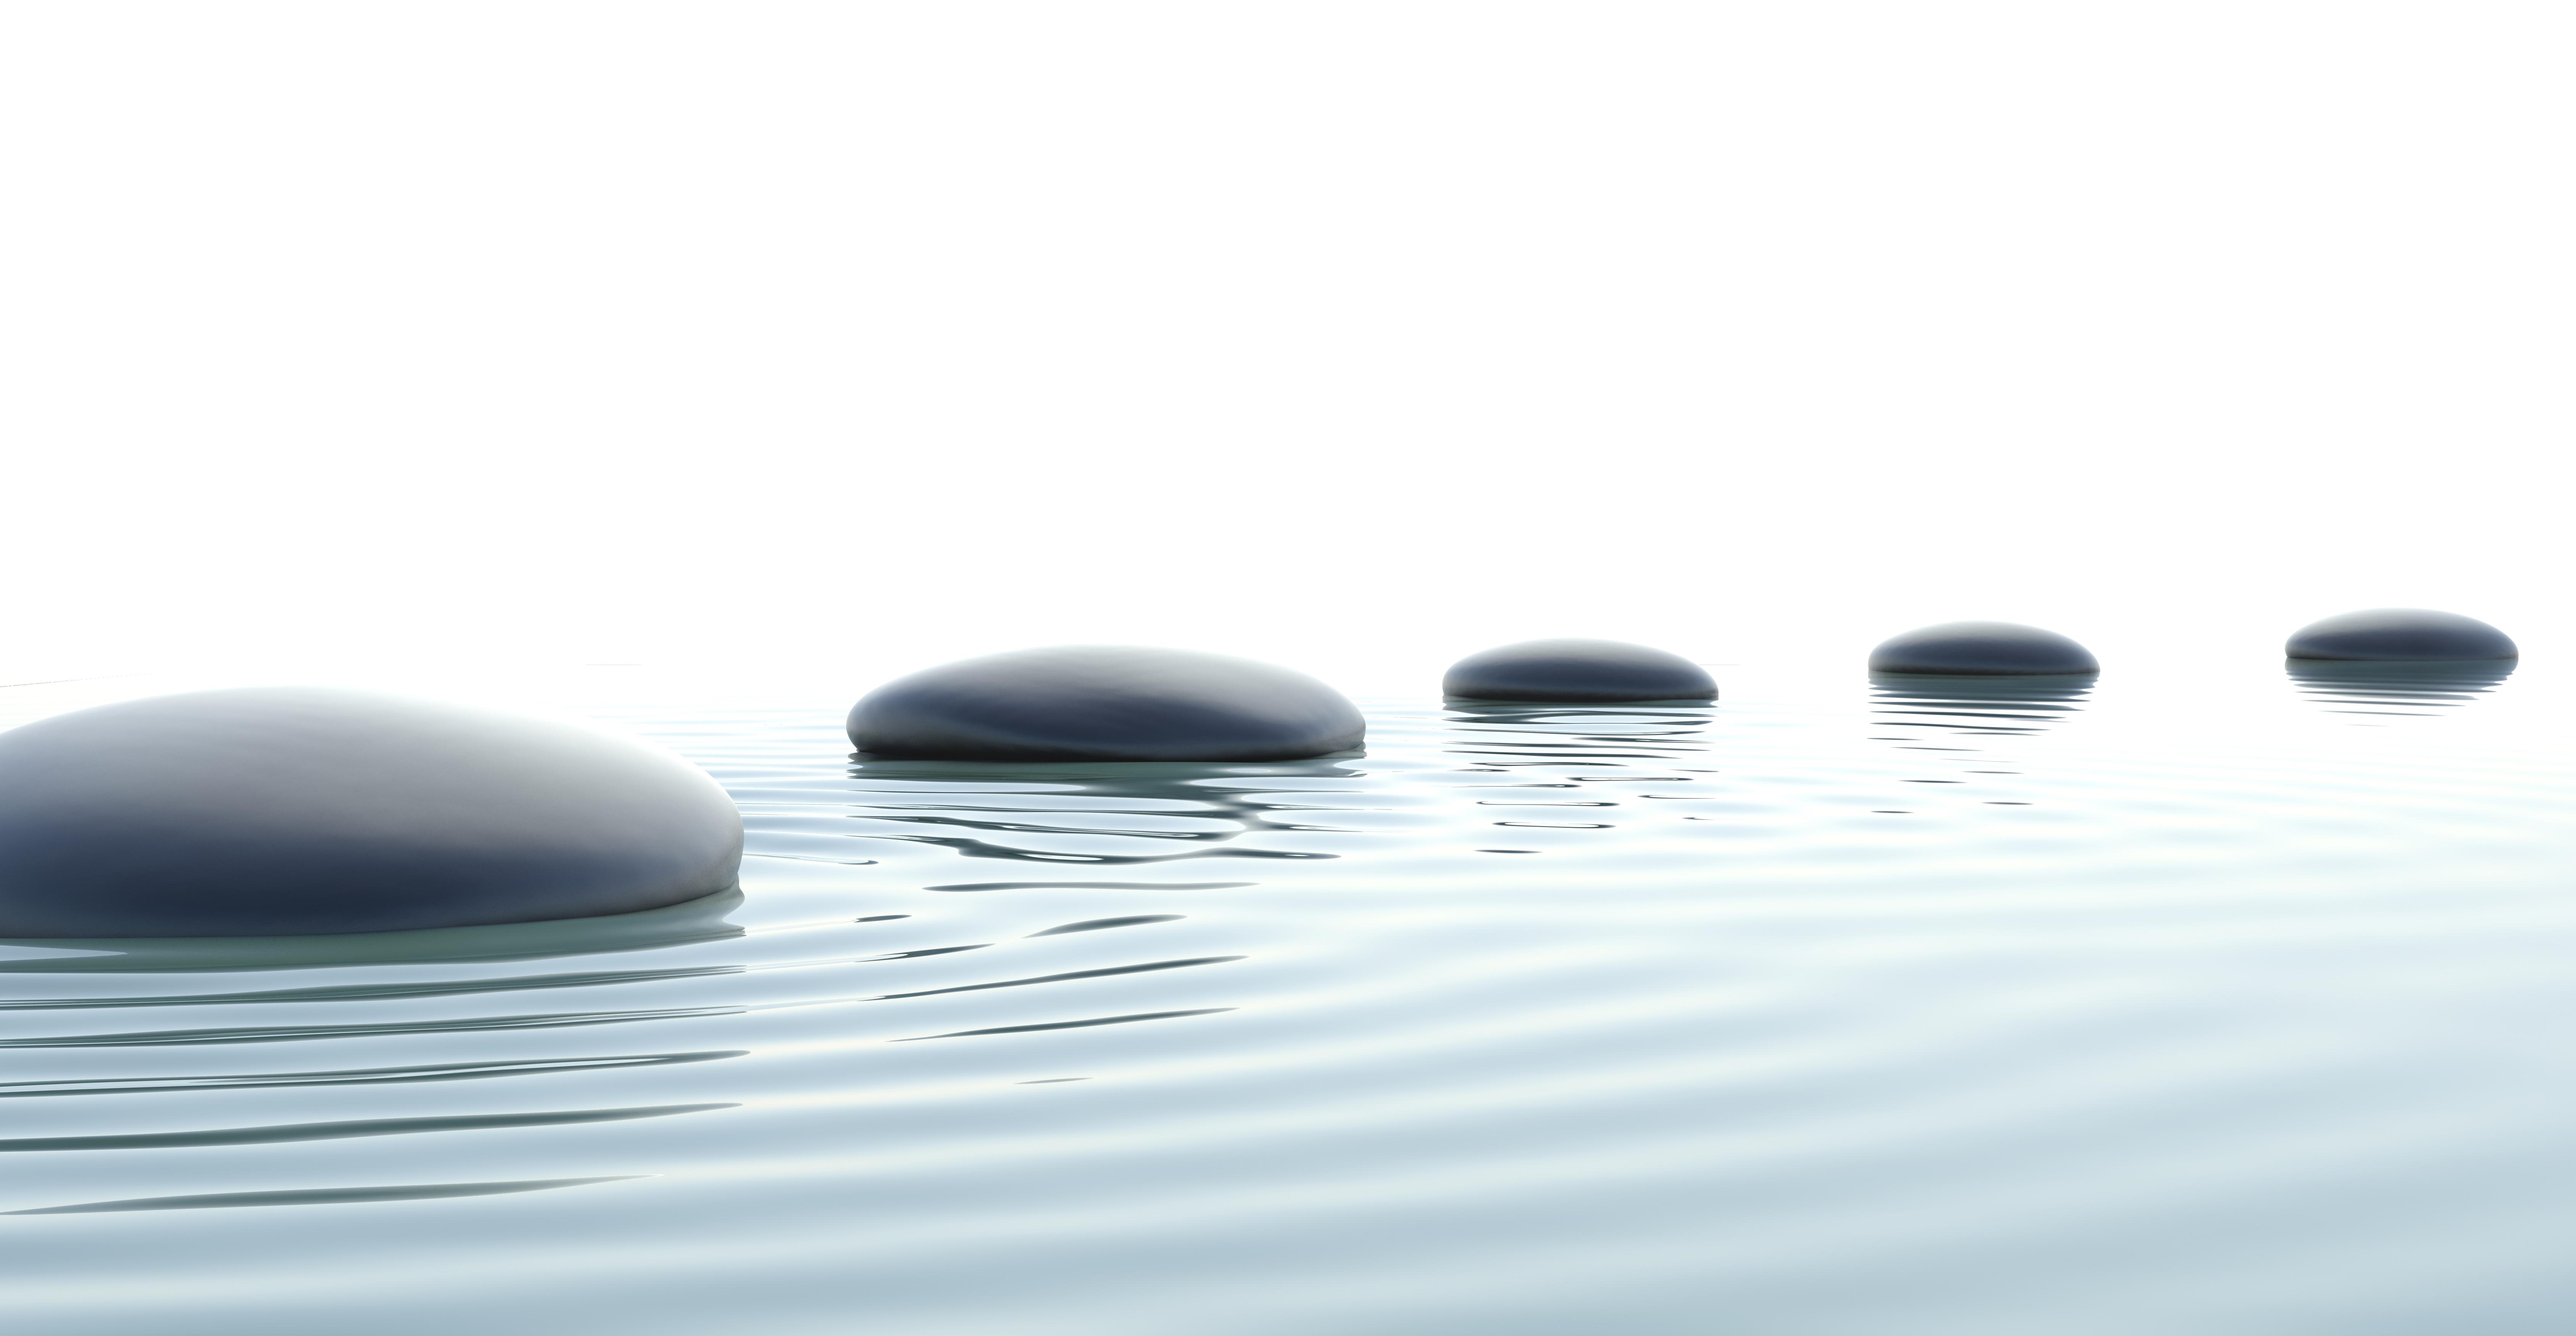 Cultivating a successful mindset